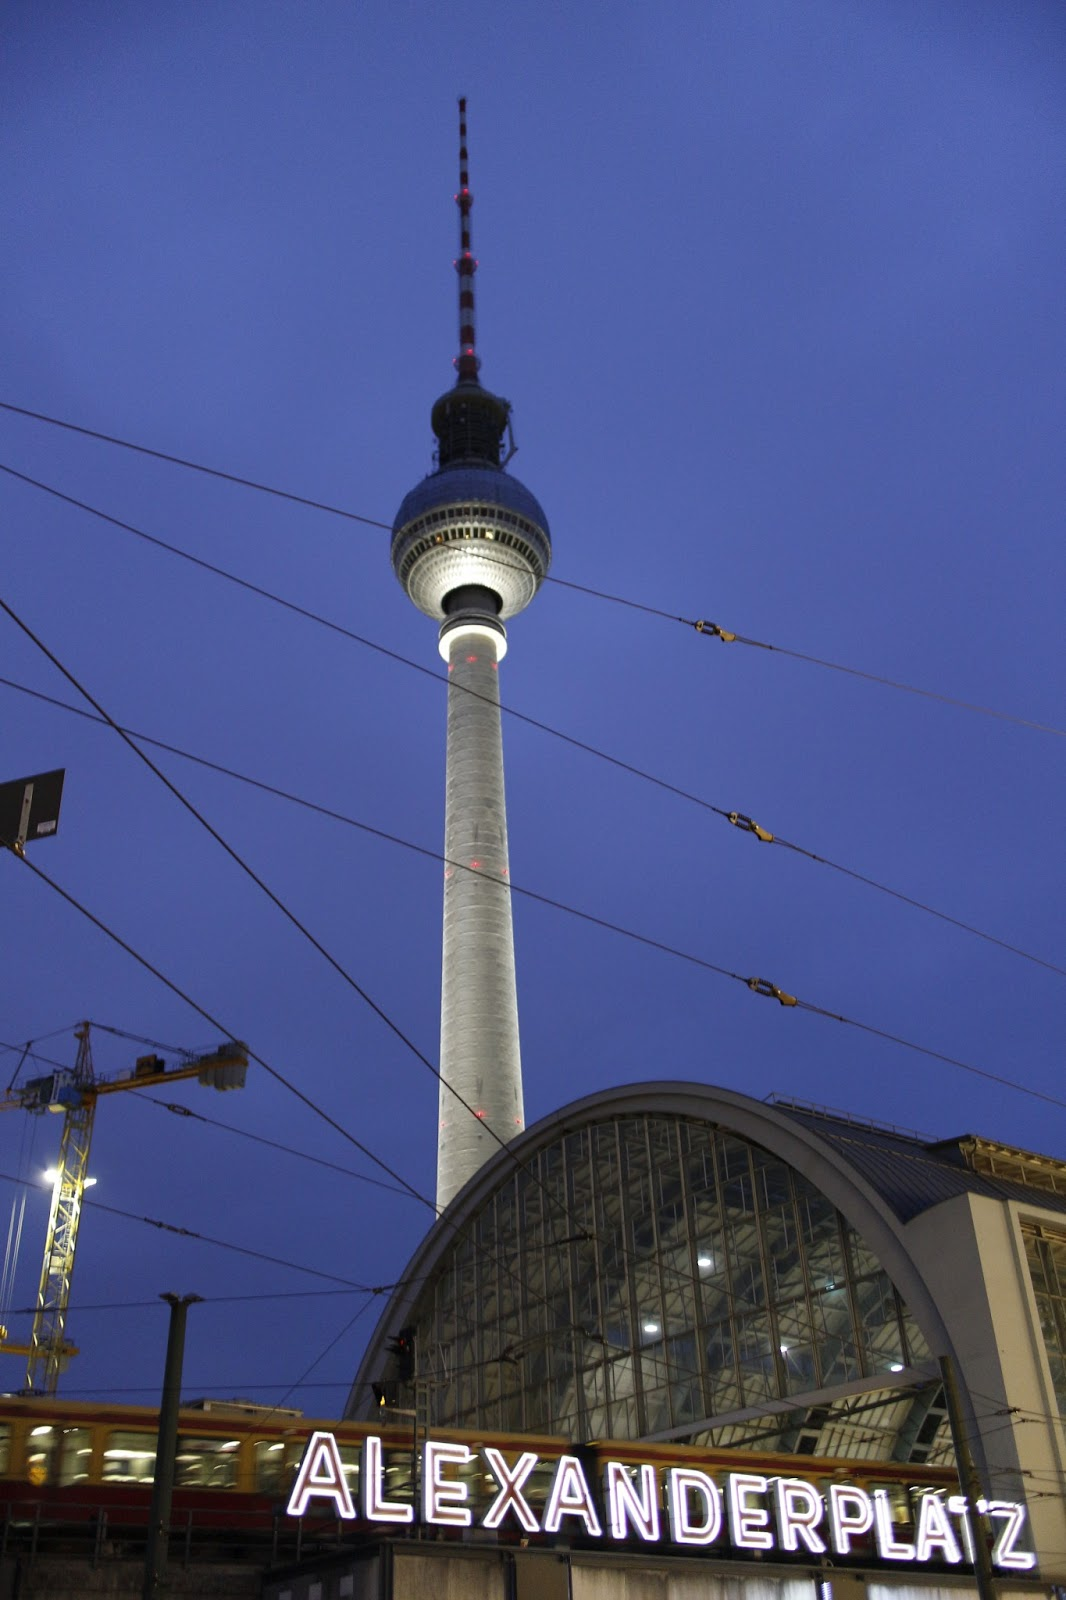 Endless Blue: Alexander Platz: Day+Night